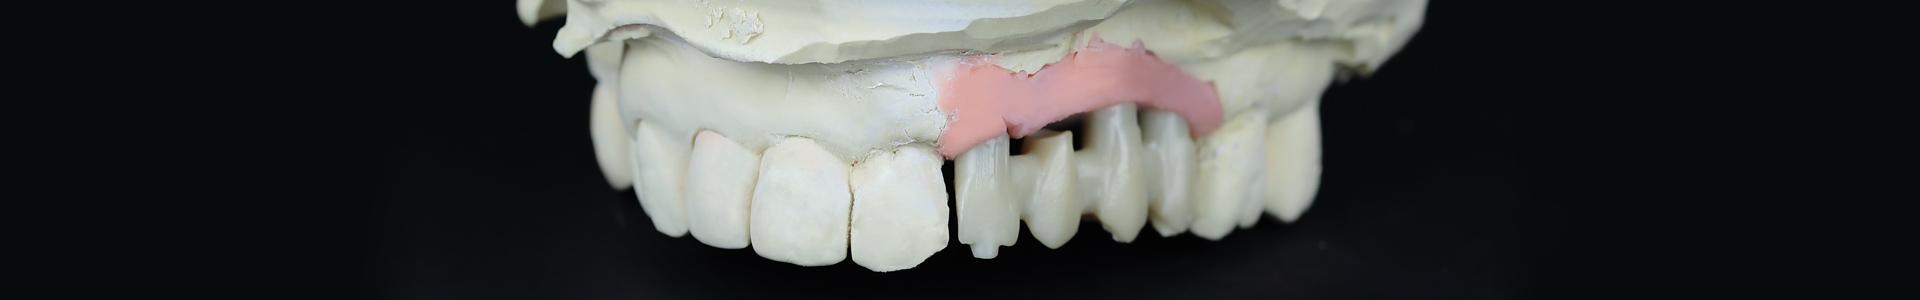 Implantologie dentaire Leroux